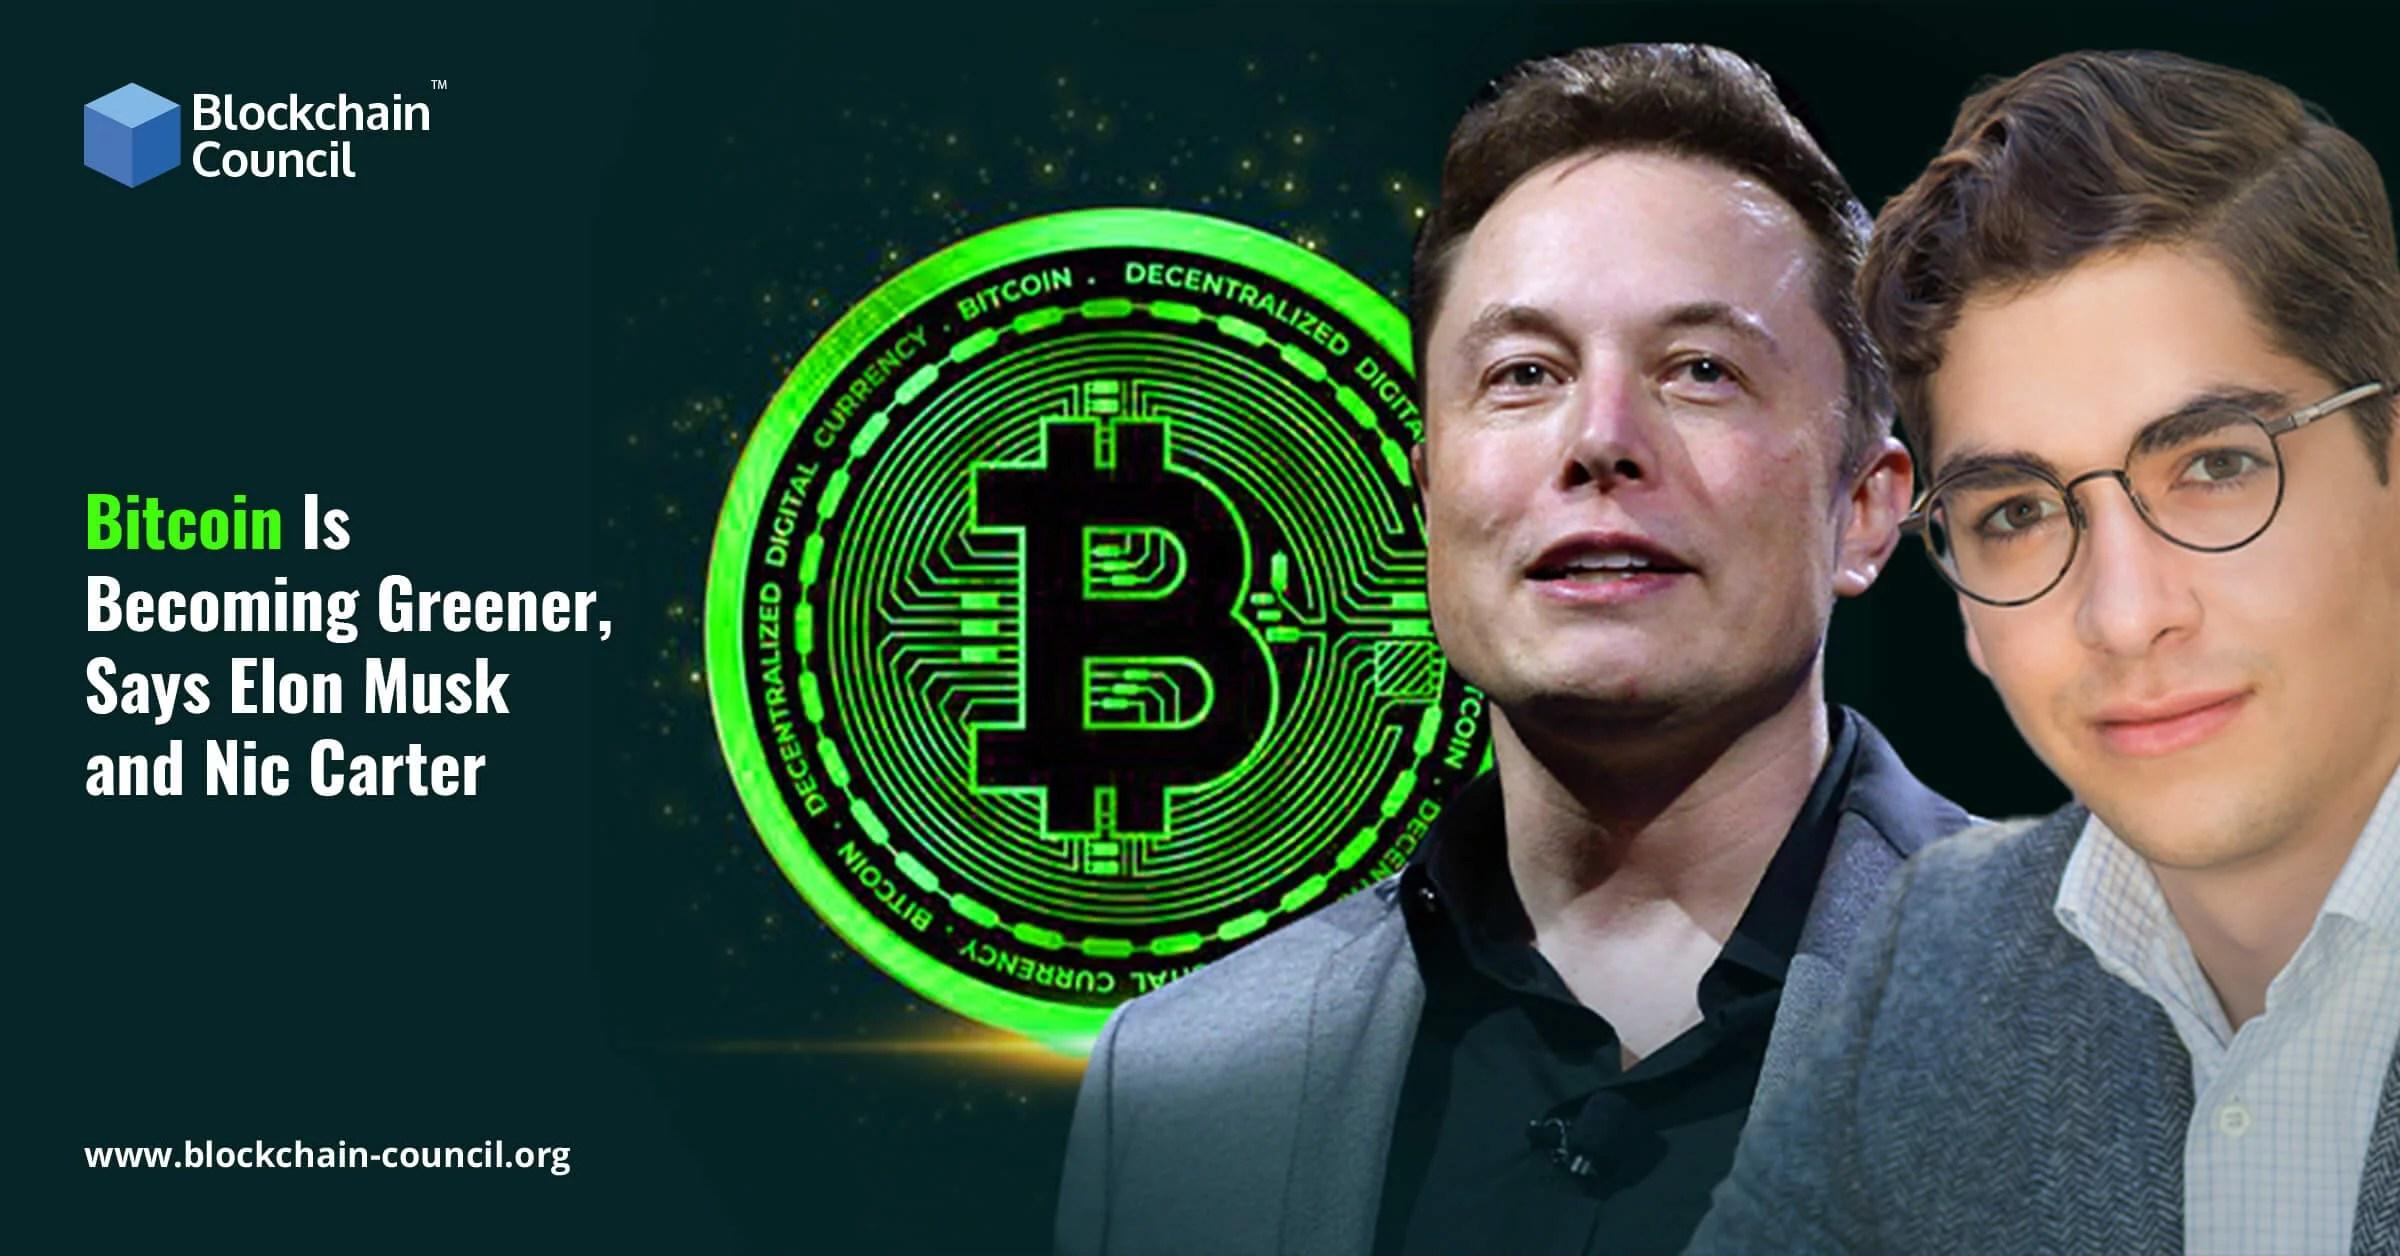 Bitcoin Is Becoming Greener Says Elon Musk and Nic Carter